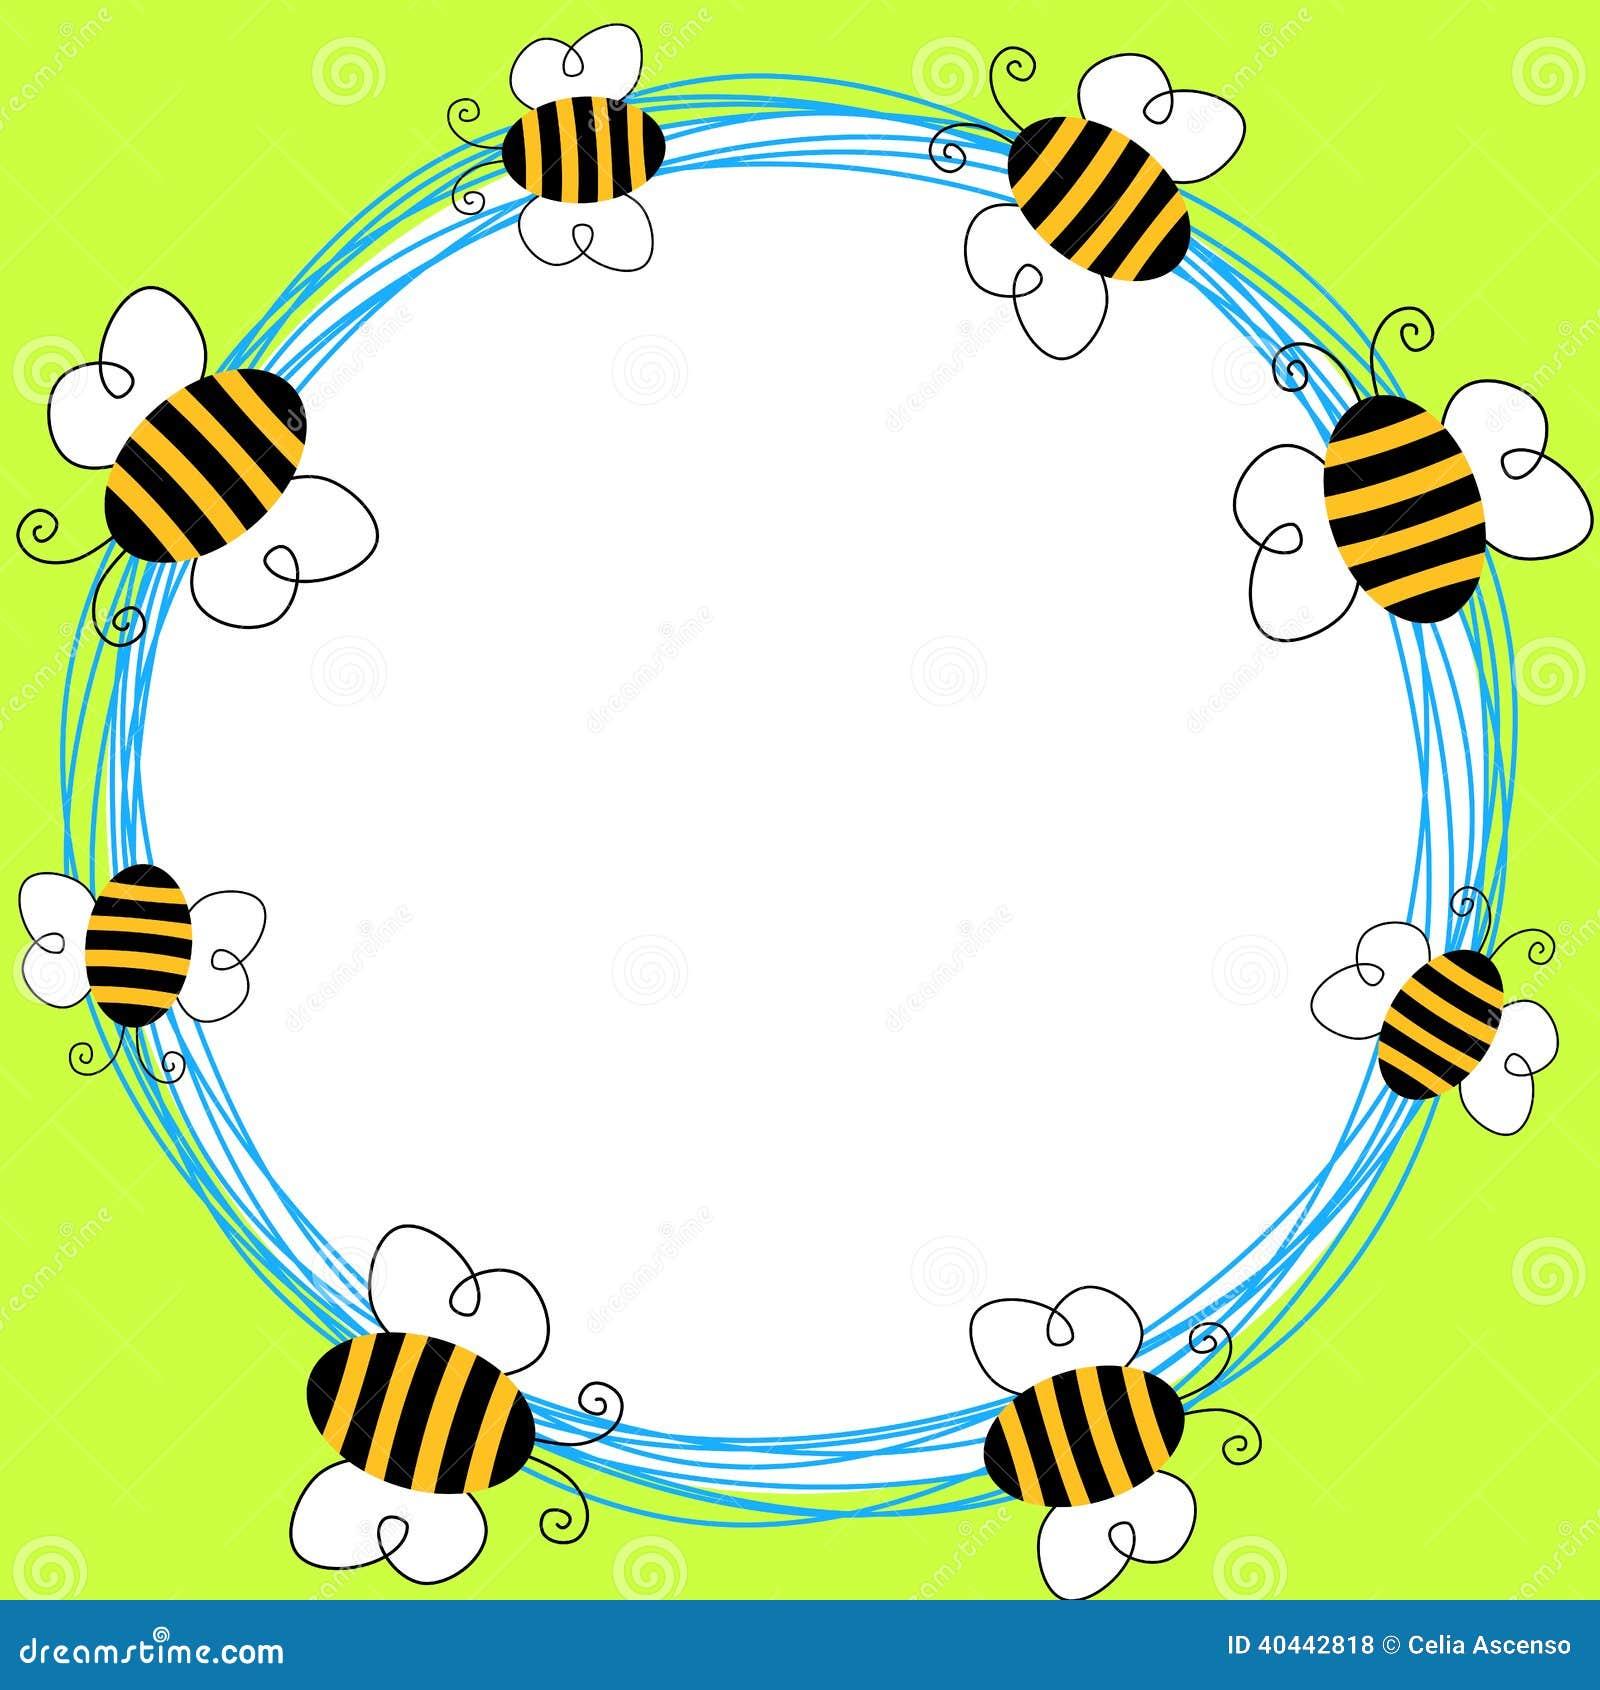 Flying Bees Round Frame Stock Illustration - Image: 40442818